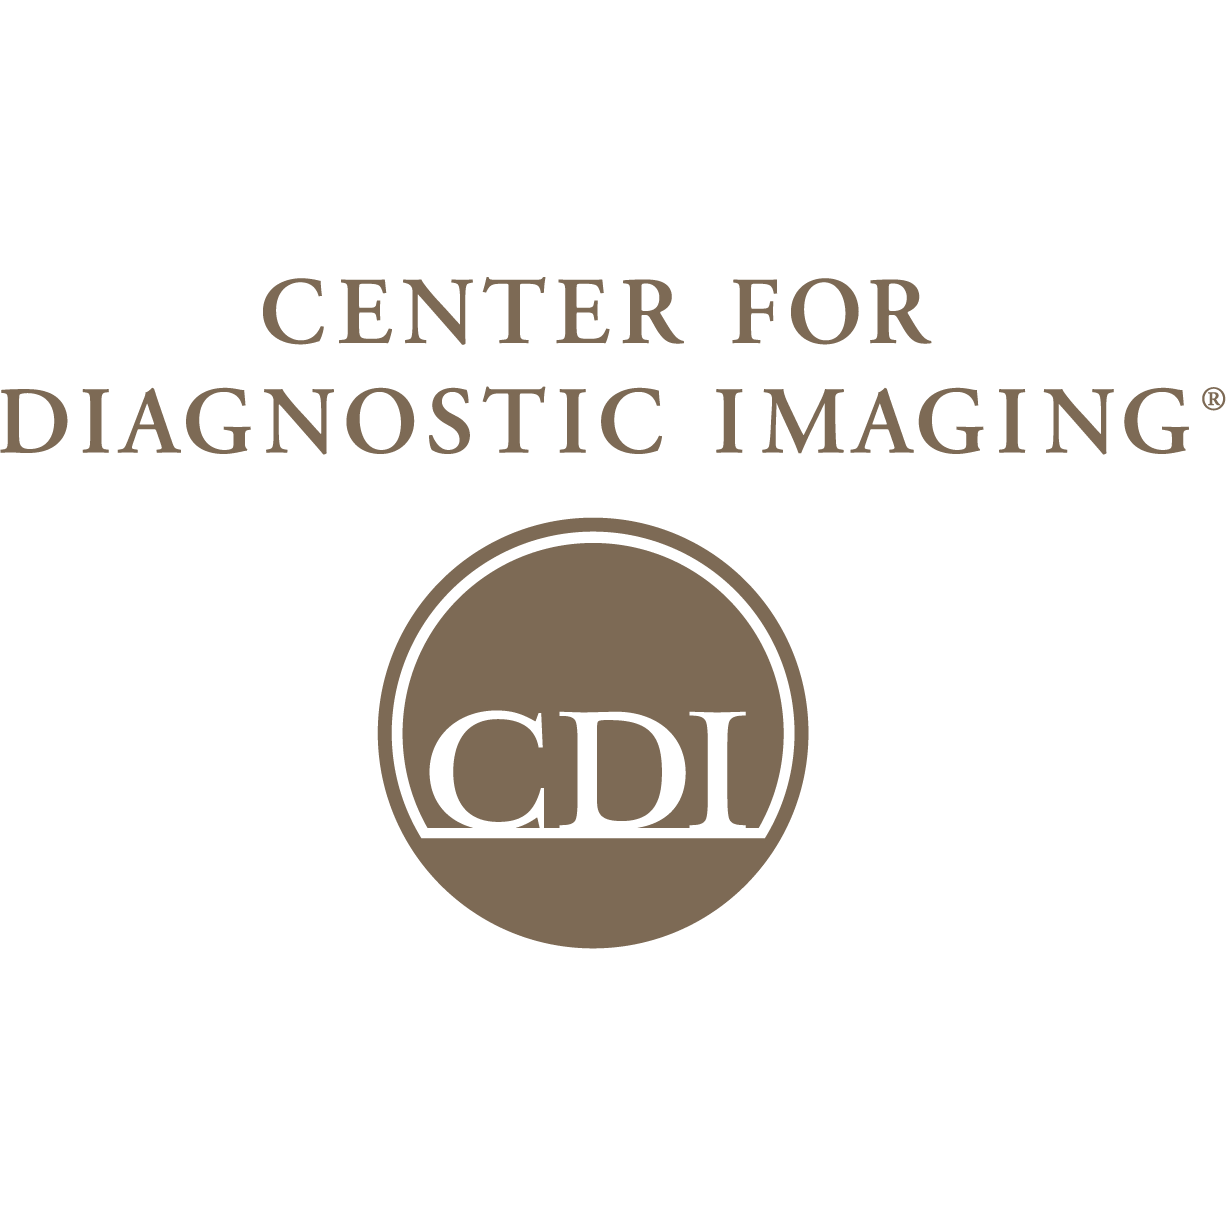 Center for Diagnostic Imaging (CDI) - DeSoto image 0